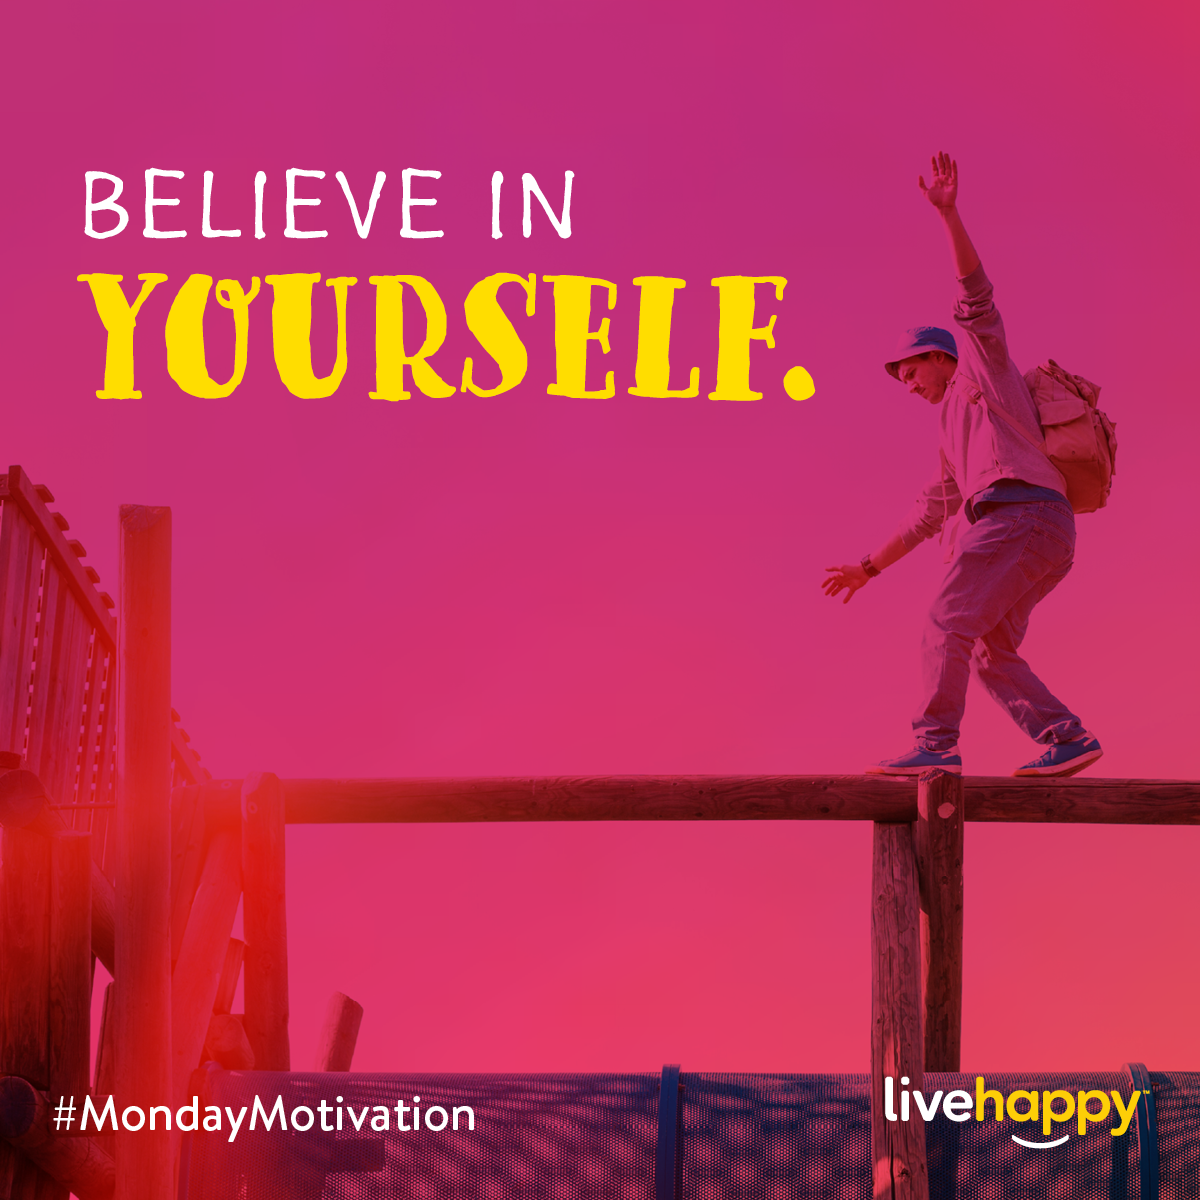 15 Aug Social Monday Motivation.png